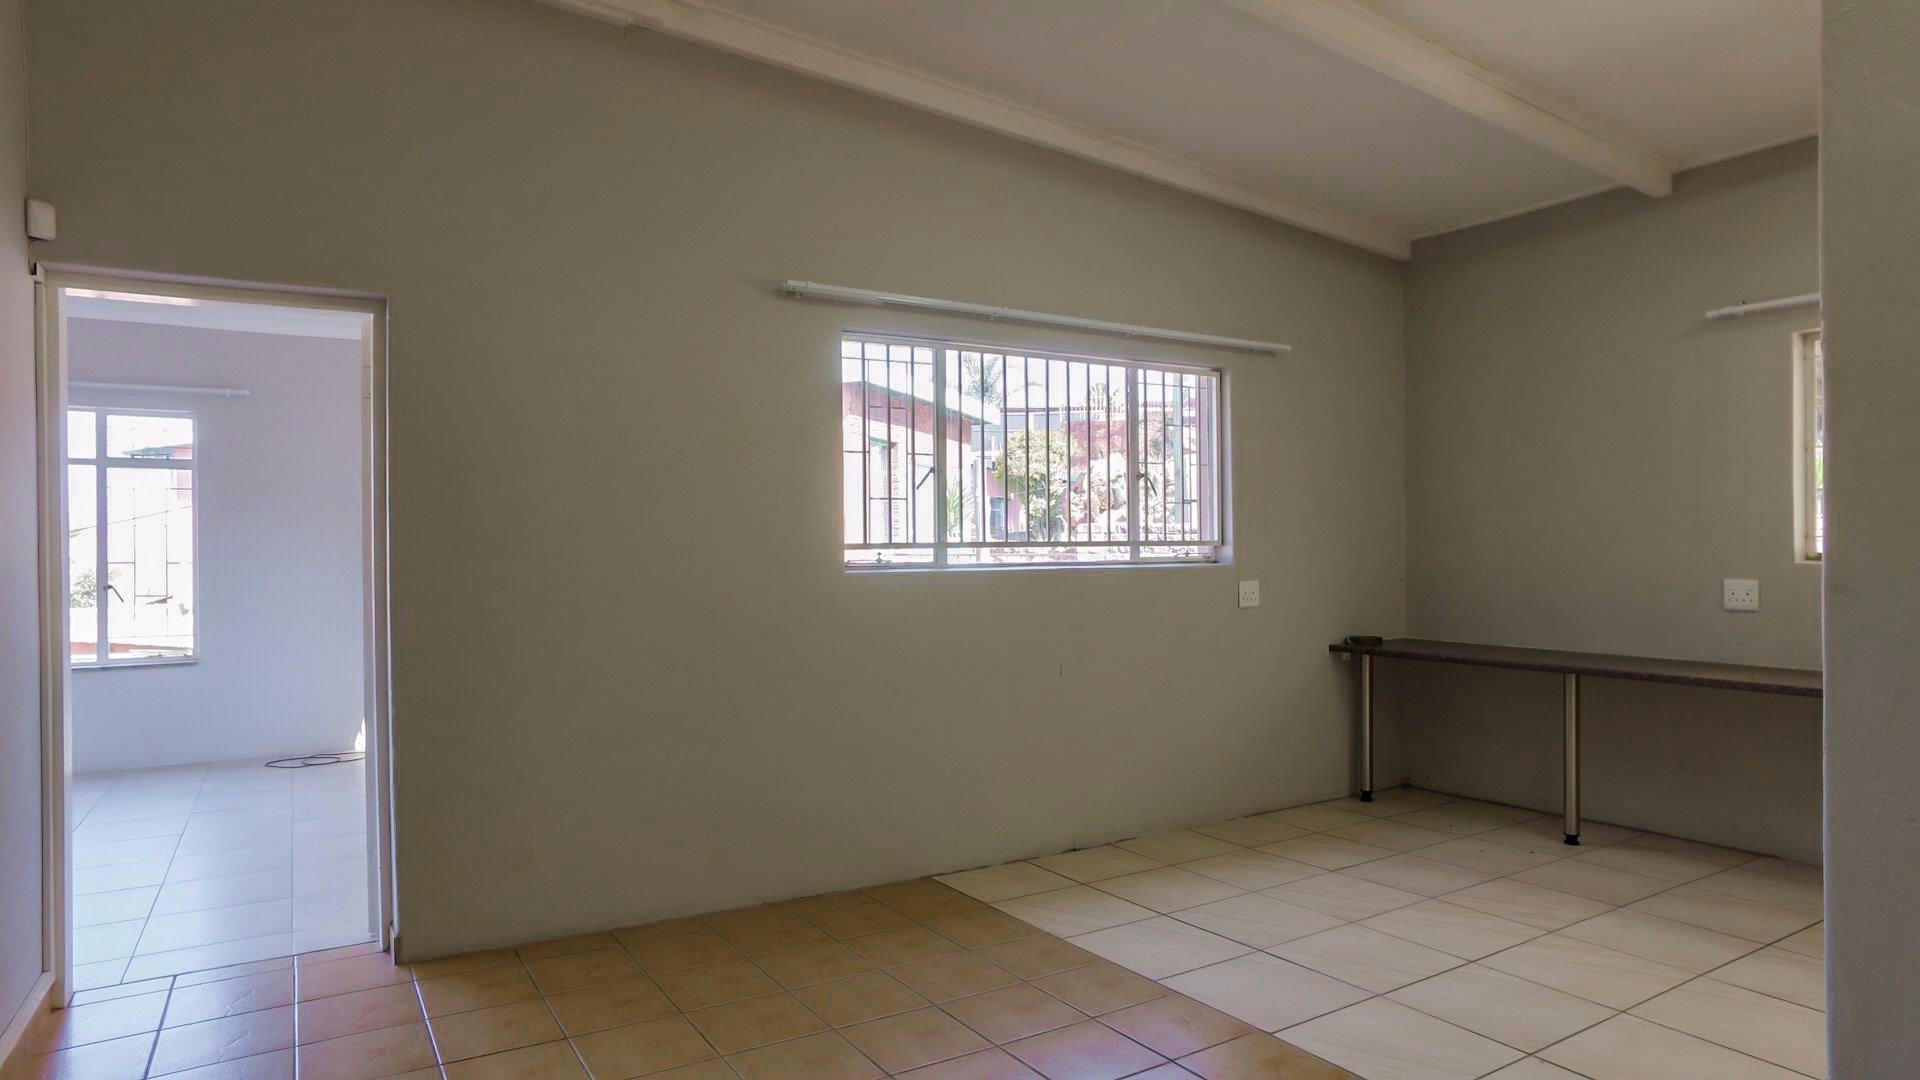 Erasmia property for sale. Ref No: 13379466. Picture no 3